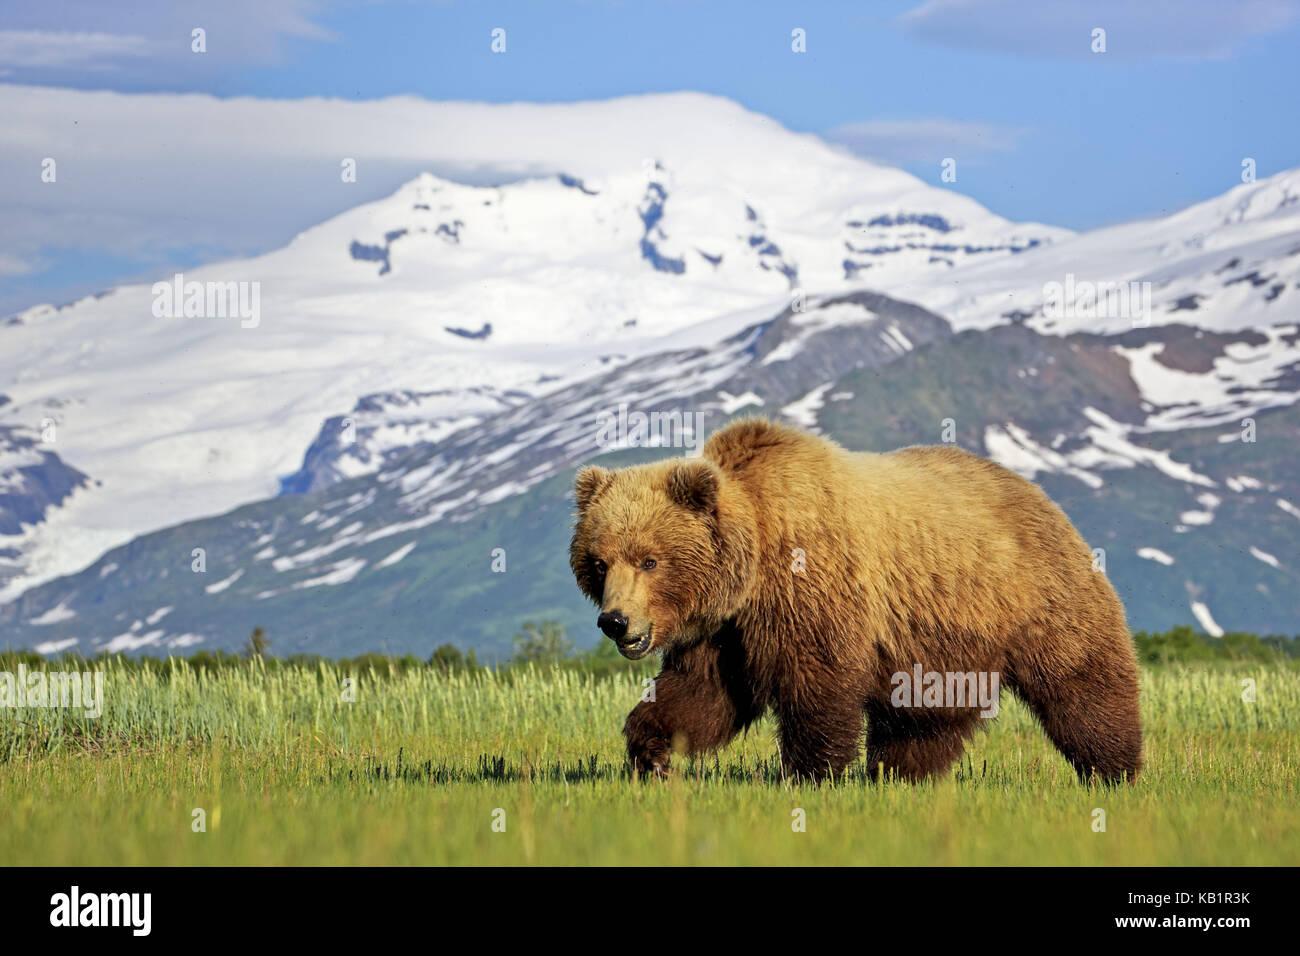 Nordamerika, USA, Alaska, Katmai National Park, Hallo, Bucht, Braunbär, Ursus arctos, Stockbild